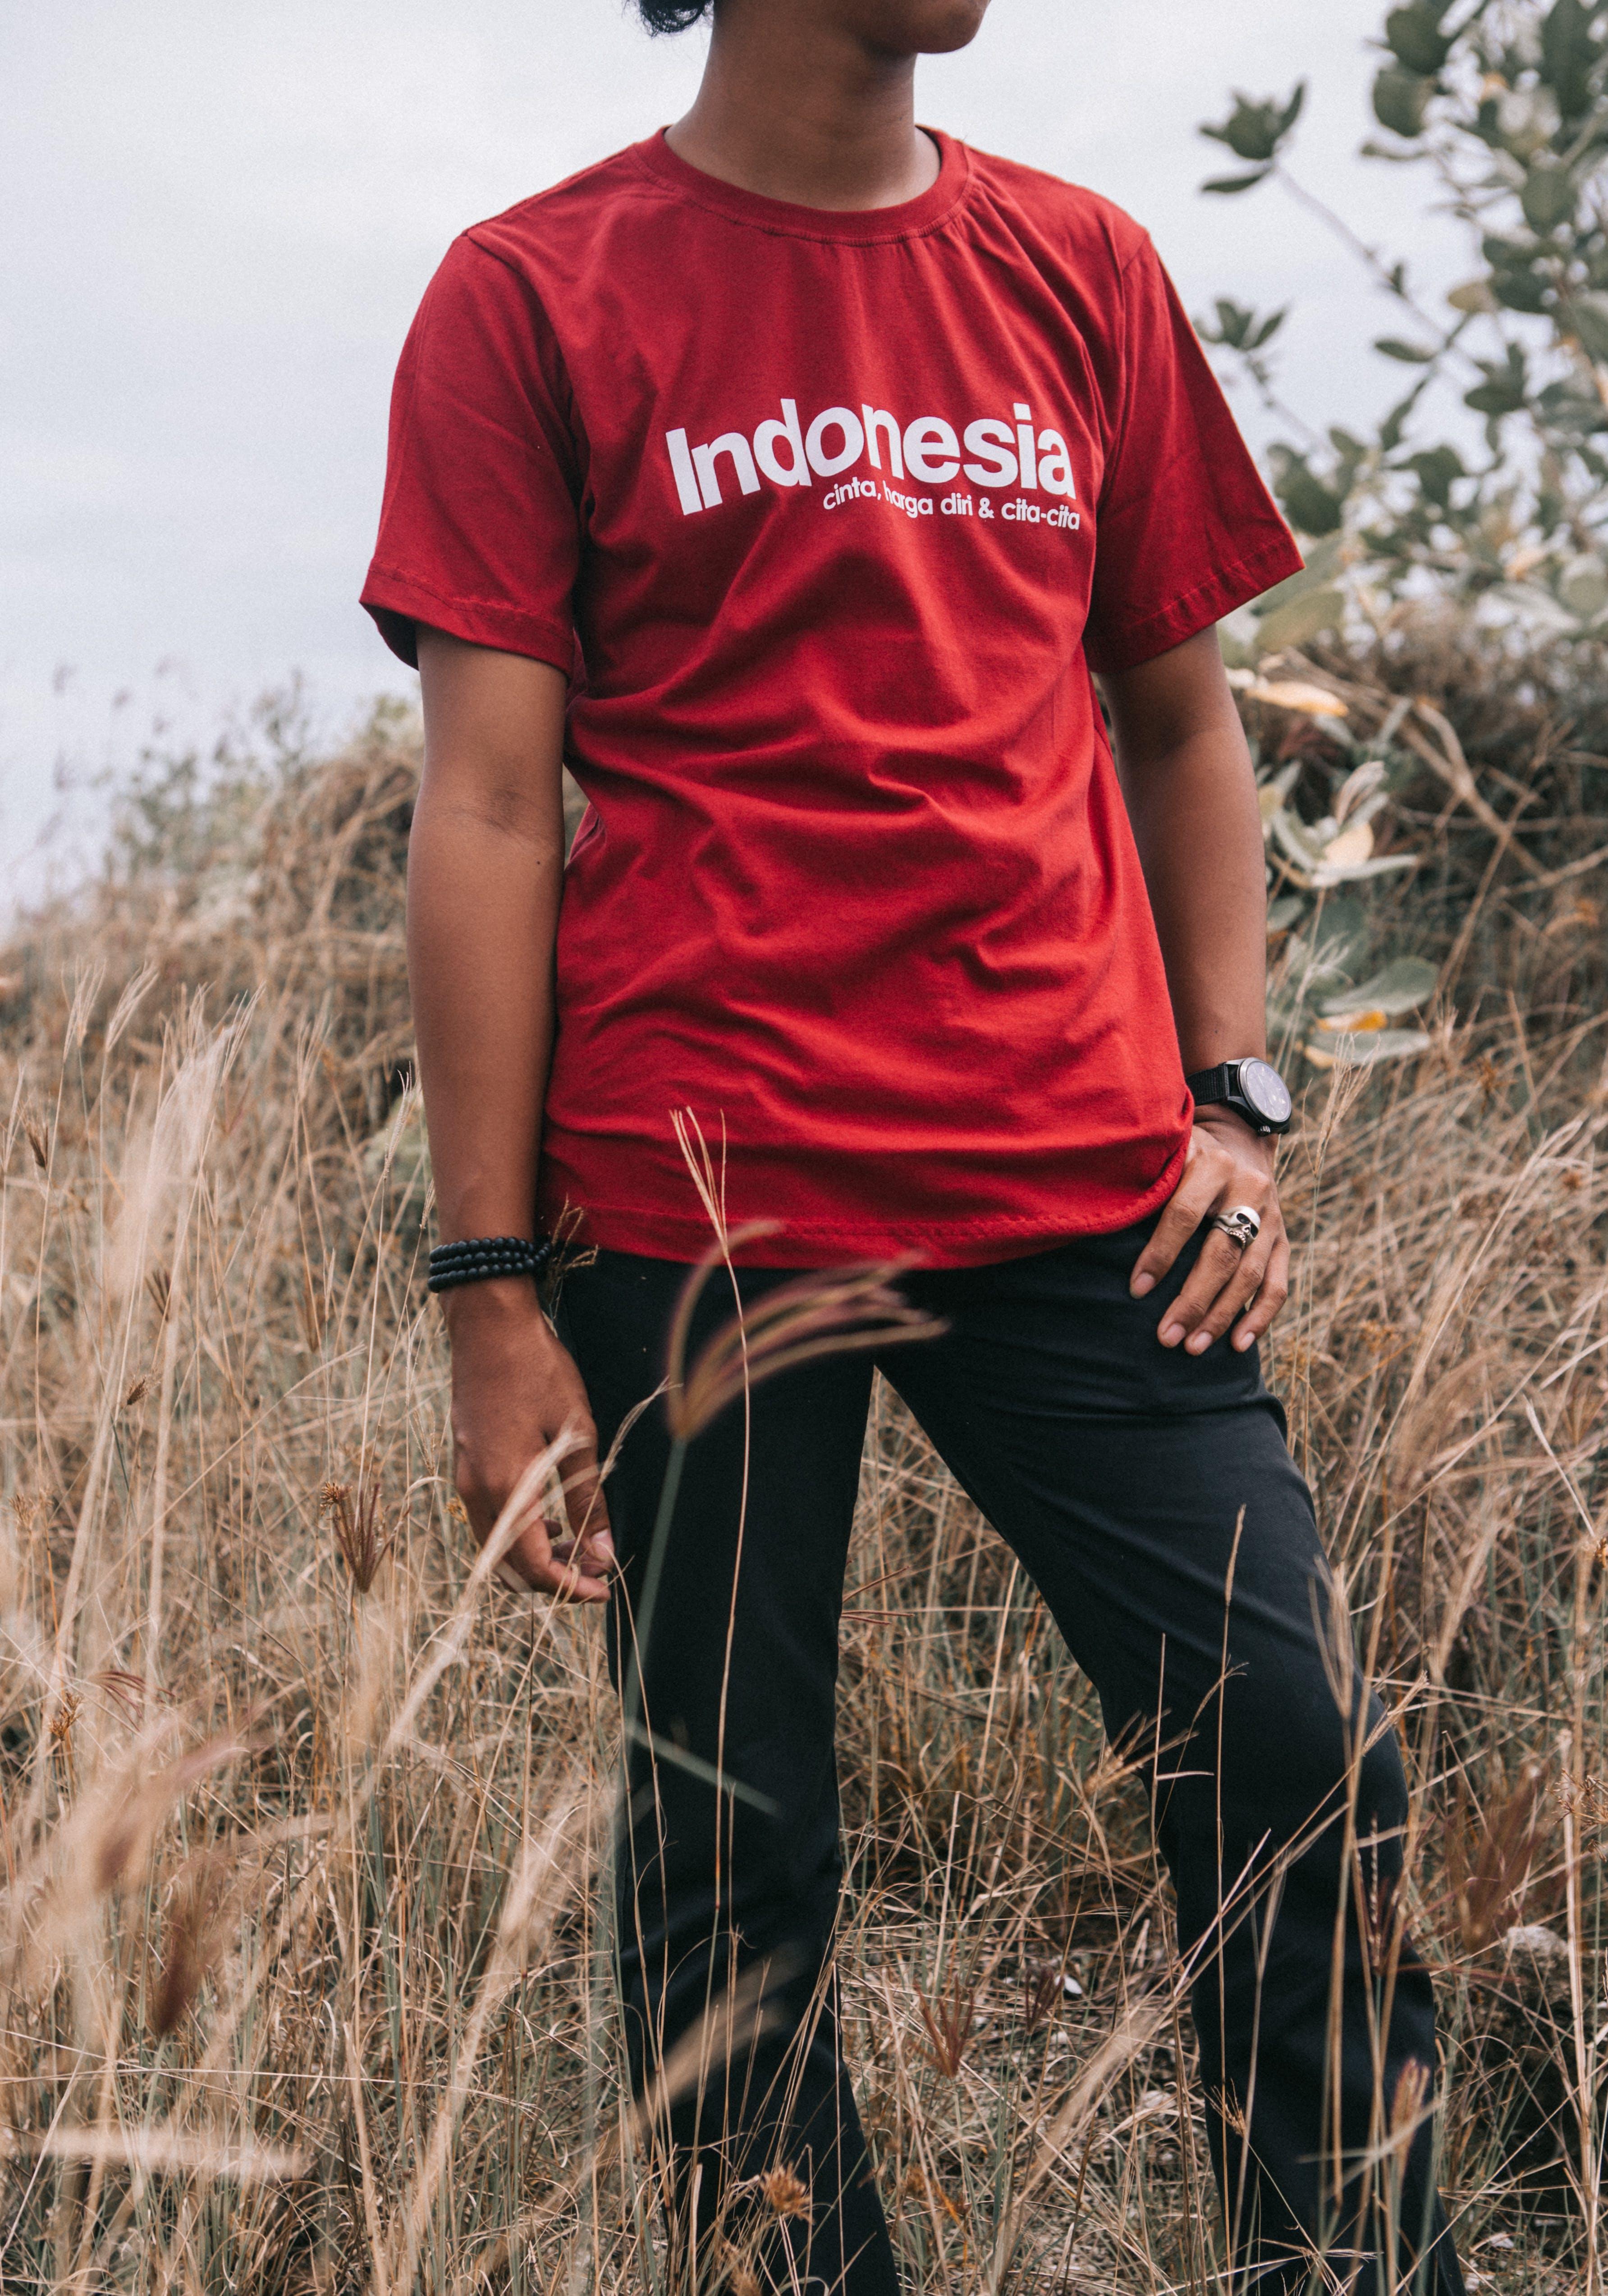 Free stock photo of desert, portrait, bali, indonesia